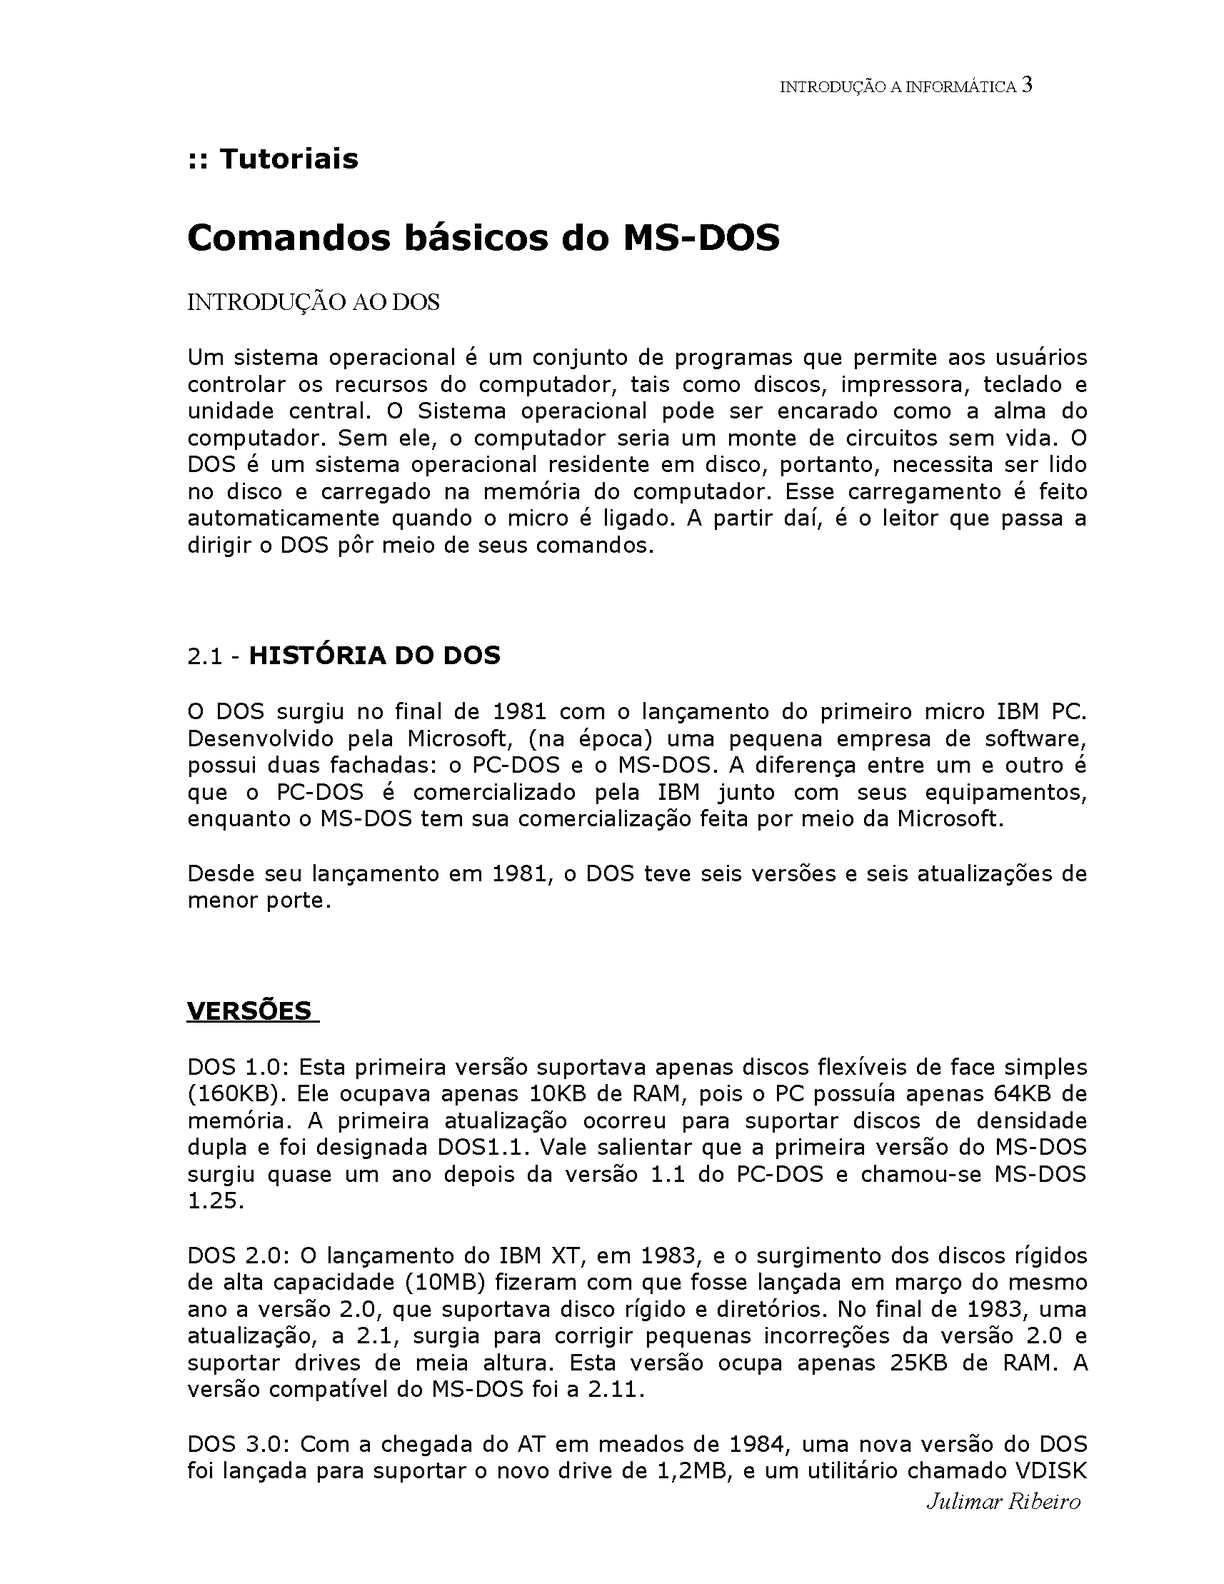 MS-DOS - CALAMEO Downloader